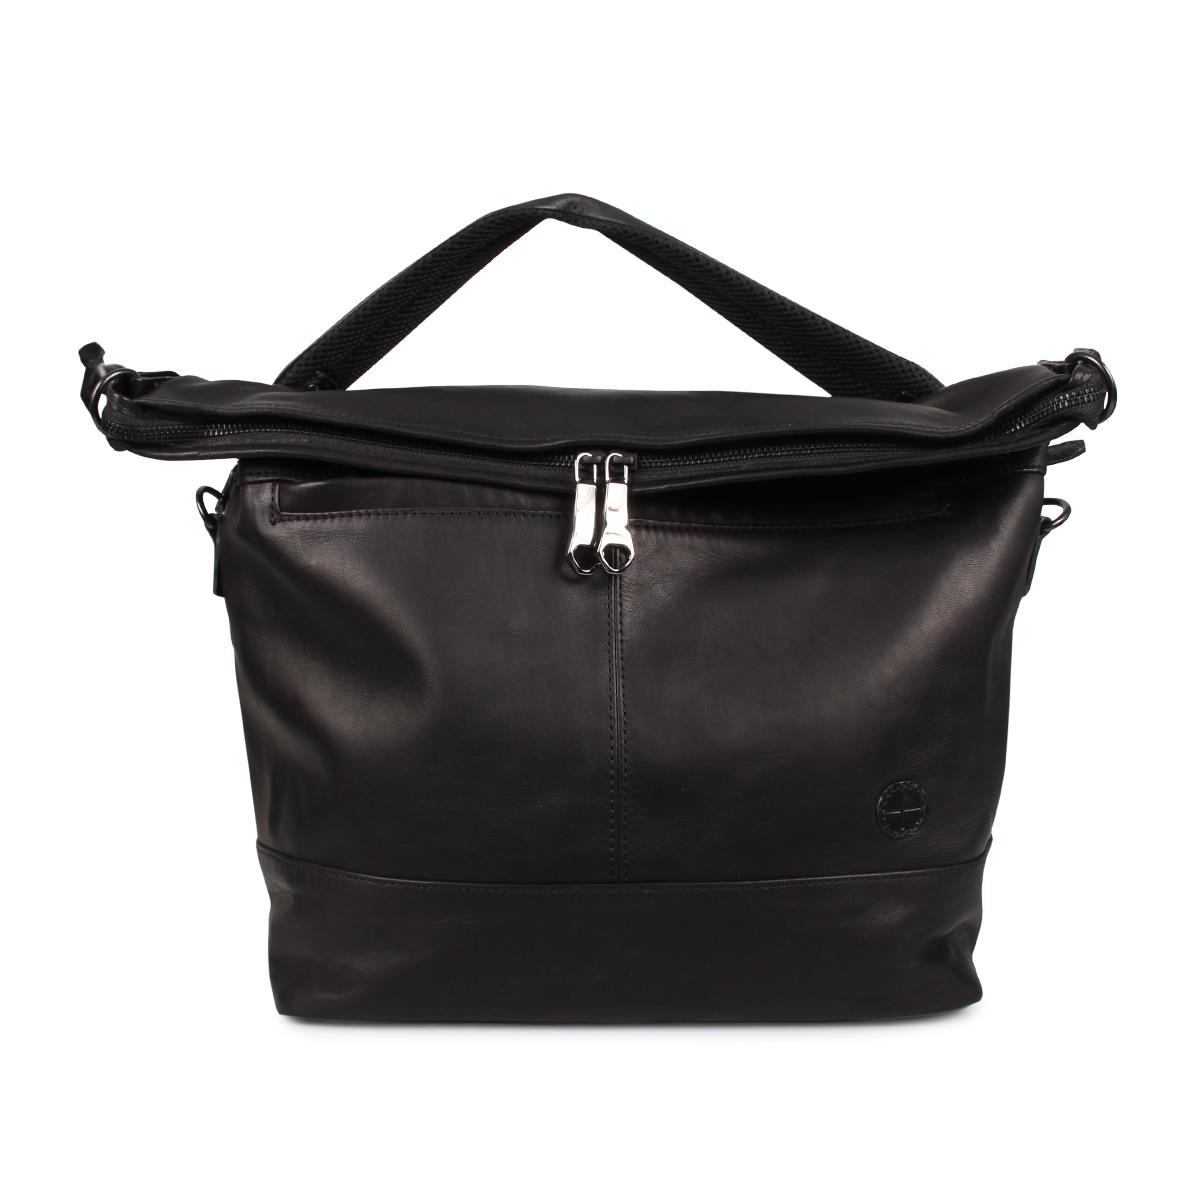 PRAY SHOULDER BAG プレイ バッグ ショルダーバッグ メンズ 13.3L ブラック 黒 PRSHD-301 [4/6 新入荷]